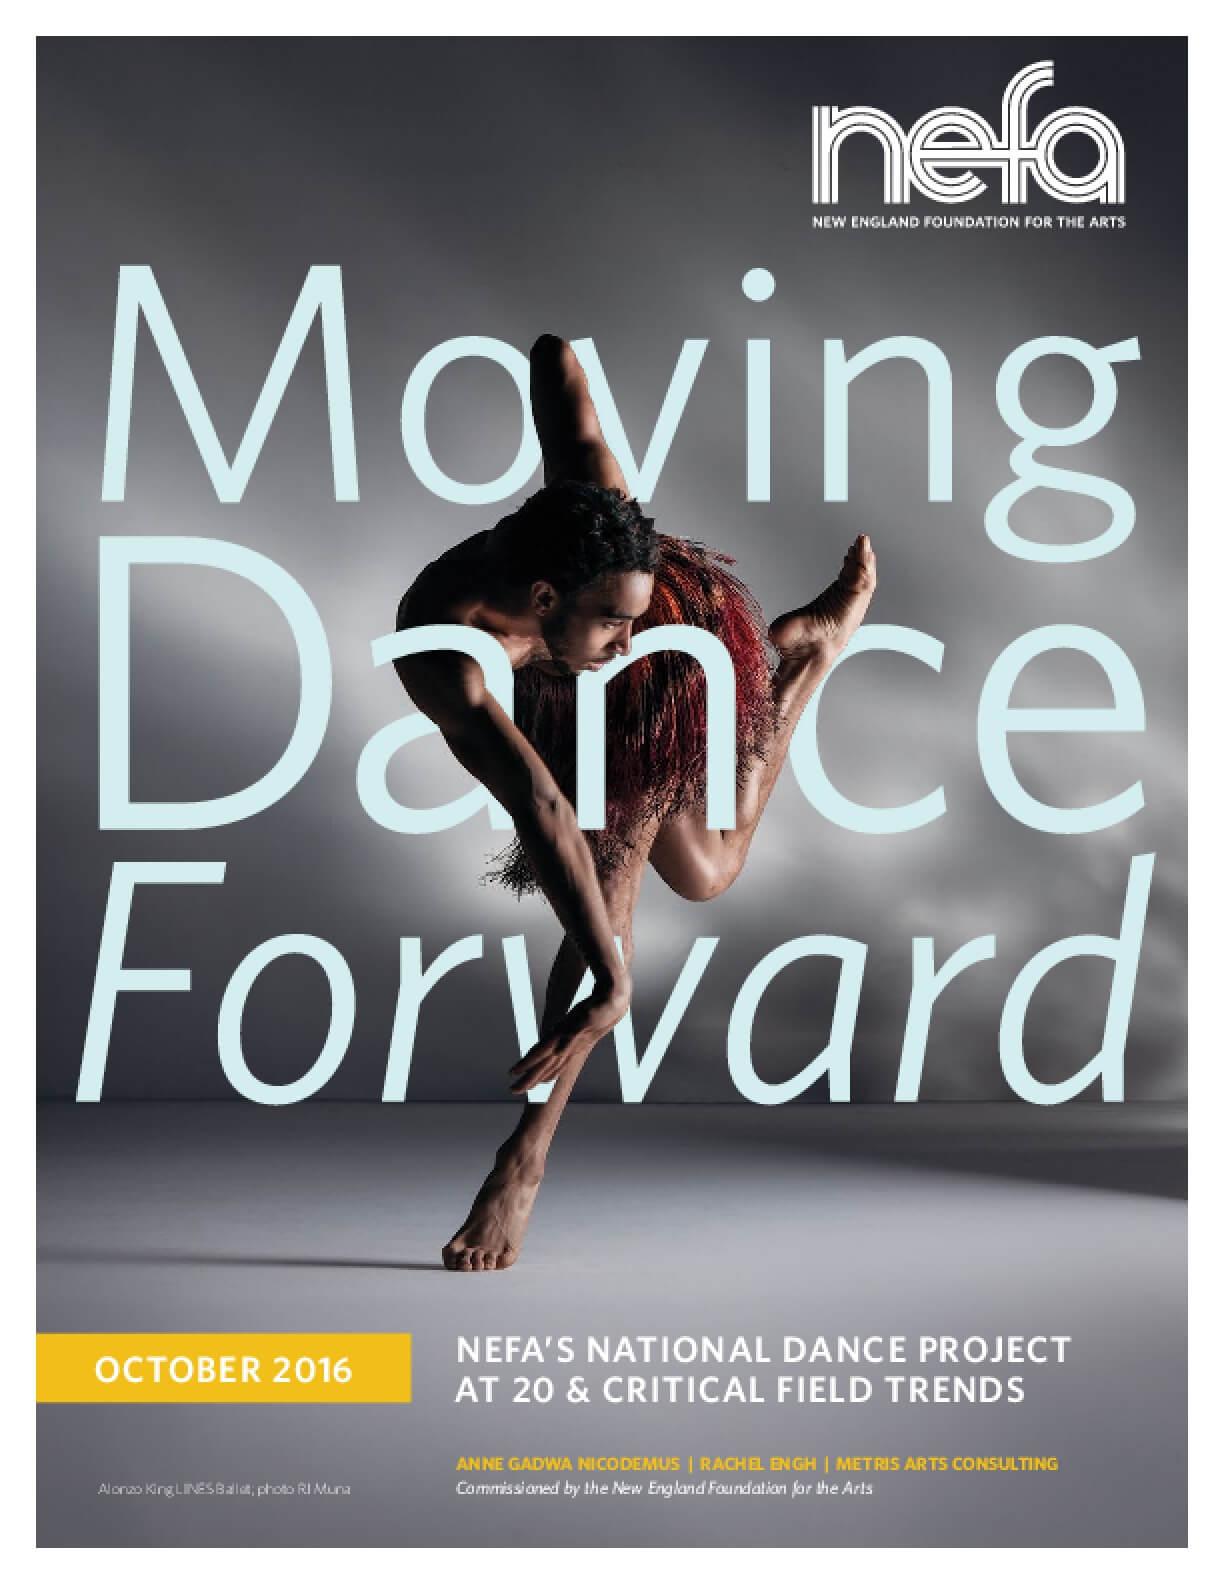 Moving Dance Forward